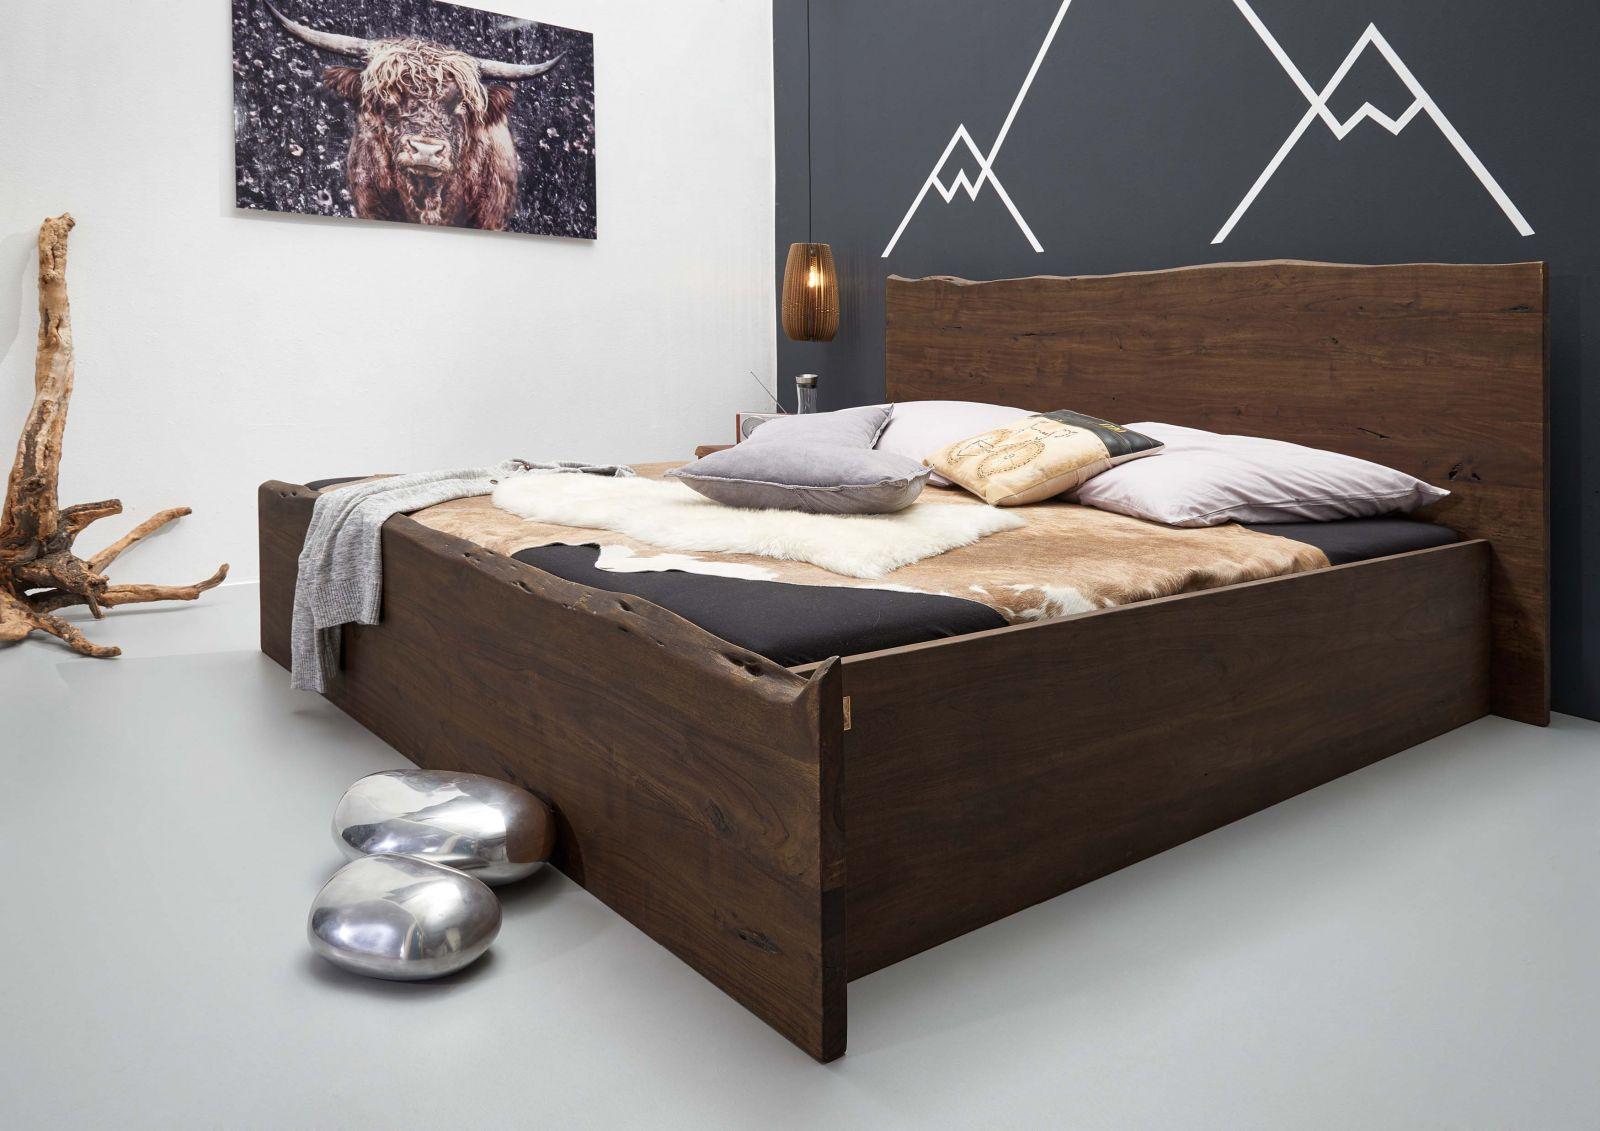 Full Size of Bett Modern Betten Holz Leader 180x200 Kaufen 140x200 Italienisches Design Puristisch Eiche Beyond Better Sleep Pillow 120x200 Aus Akazie Lackiert Braun Wohnzimmer Bett Modern